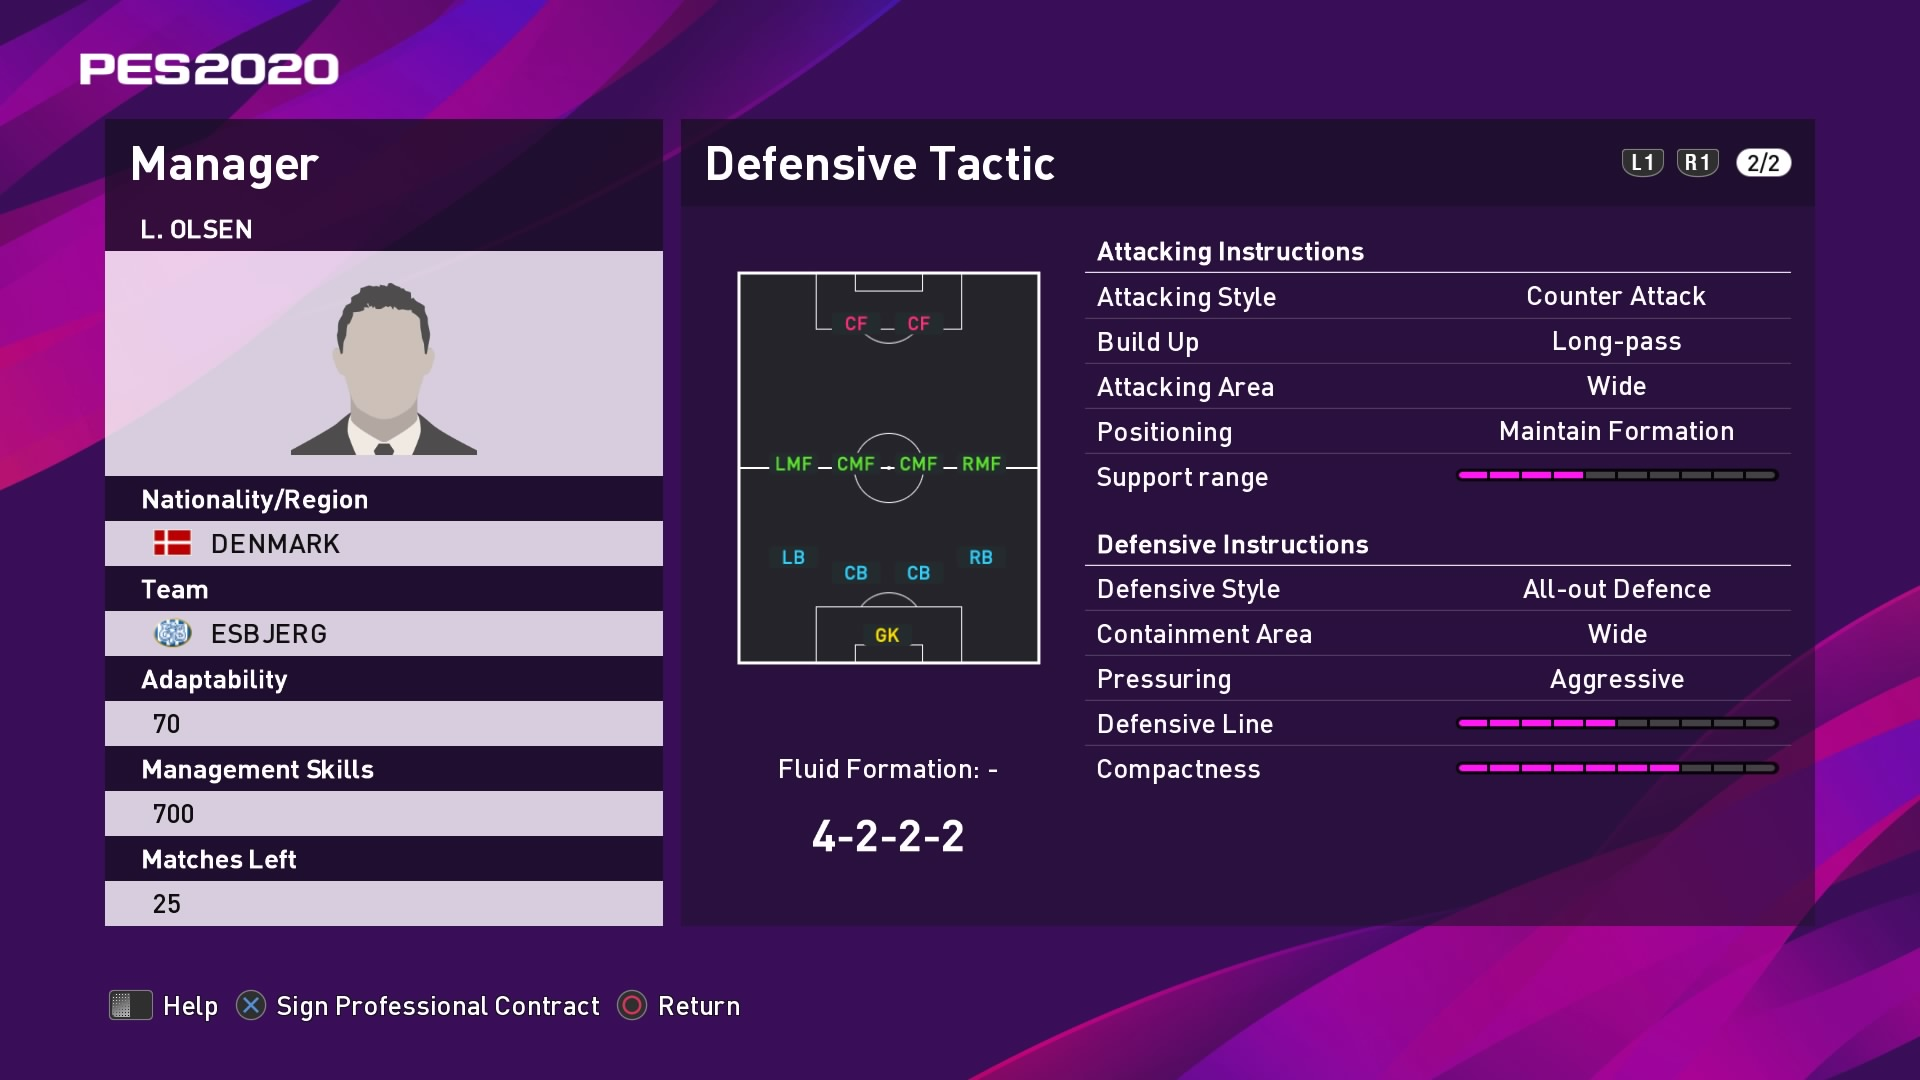 L. Olsen (Lars Olsen) Defensive Tactic in PES 2020 myClub